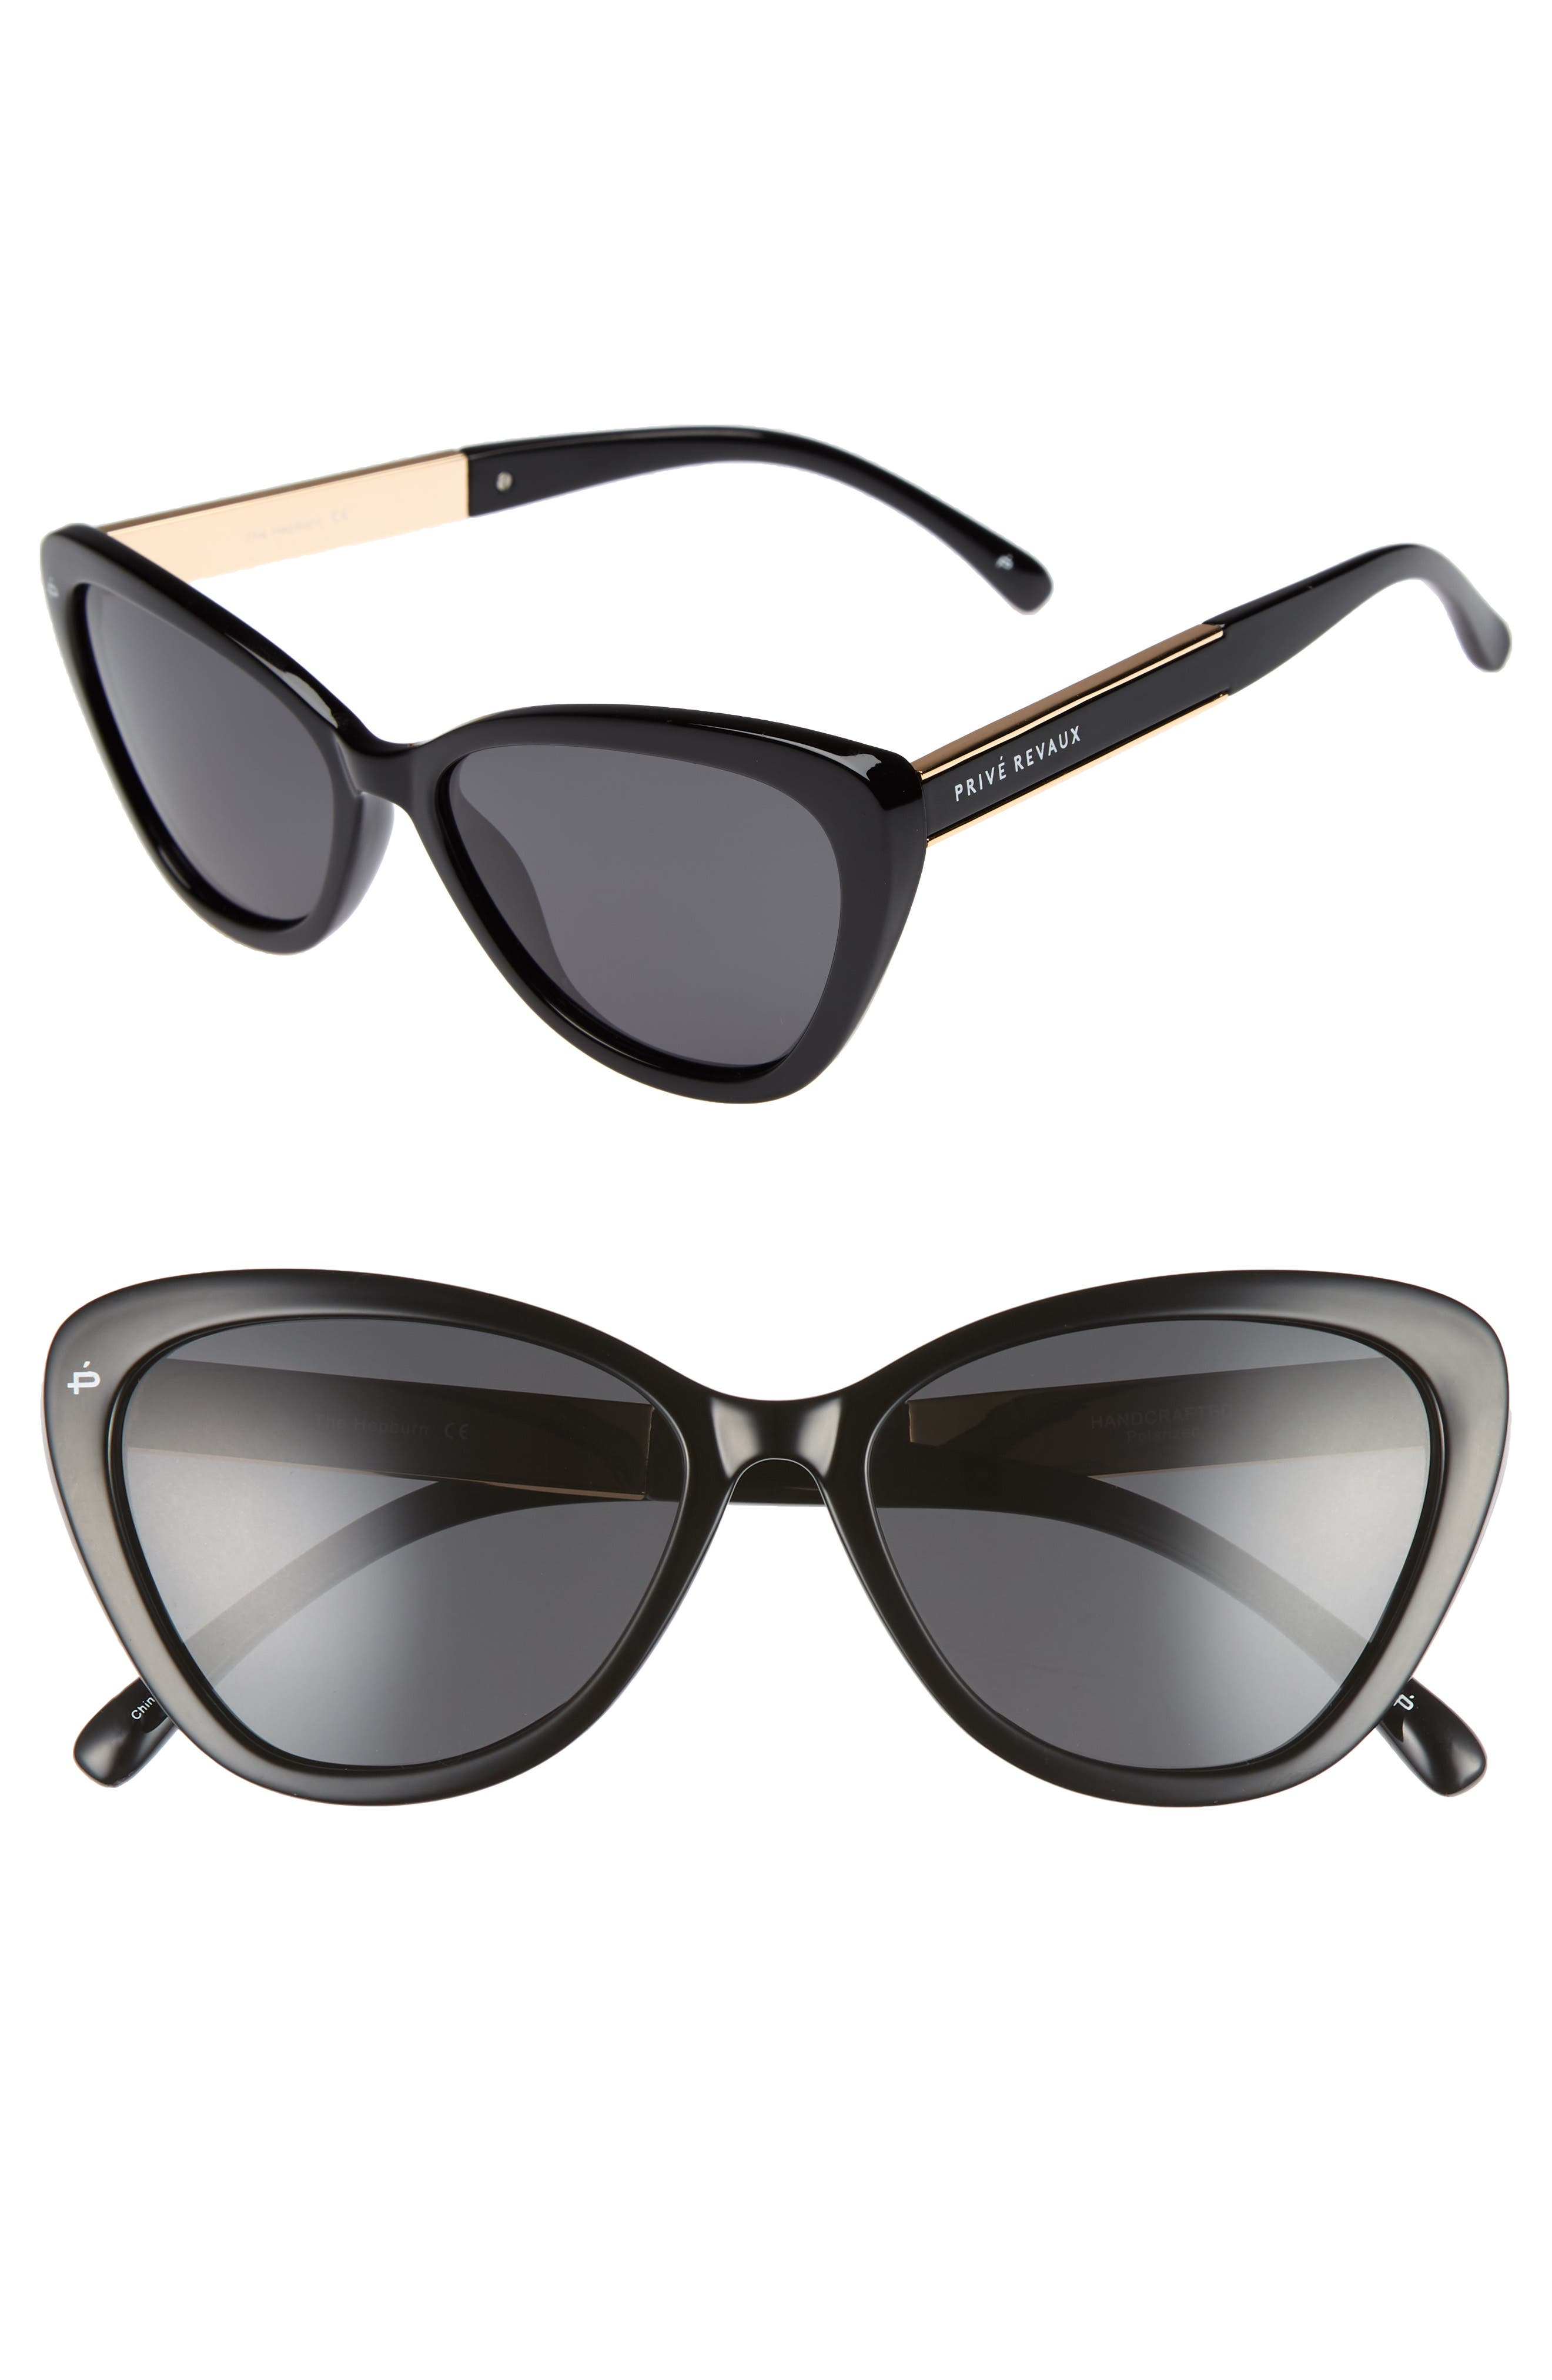 Privé Revaux The Hepburn 56mm Cat Eye Sunglasses,                             Main thumbnail 1, color,                             BLACK